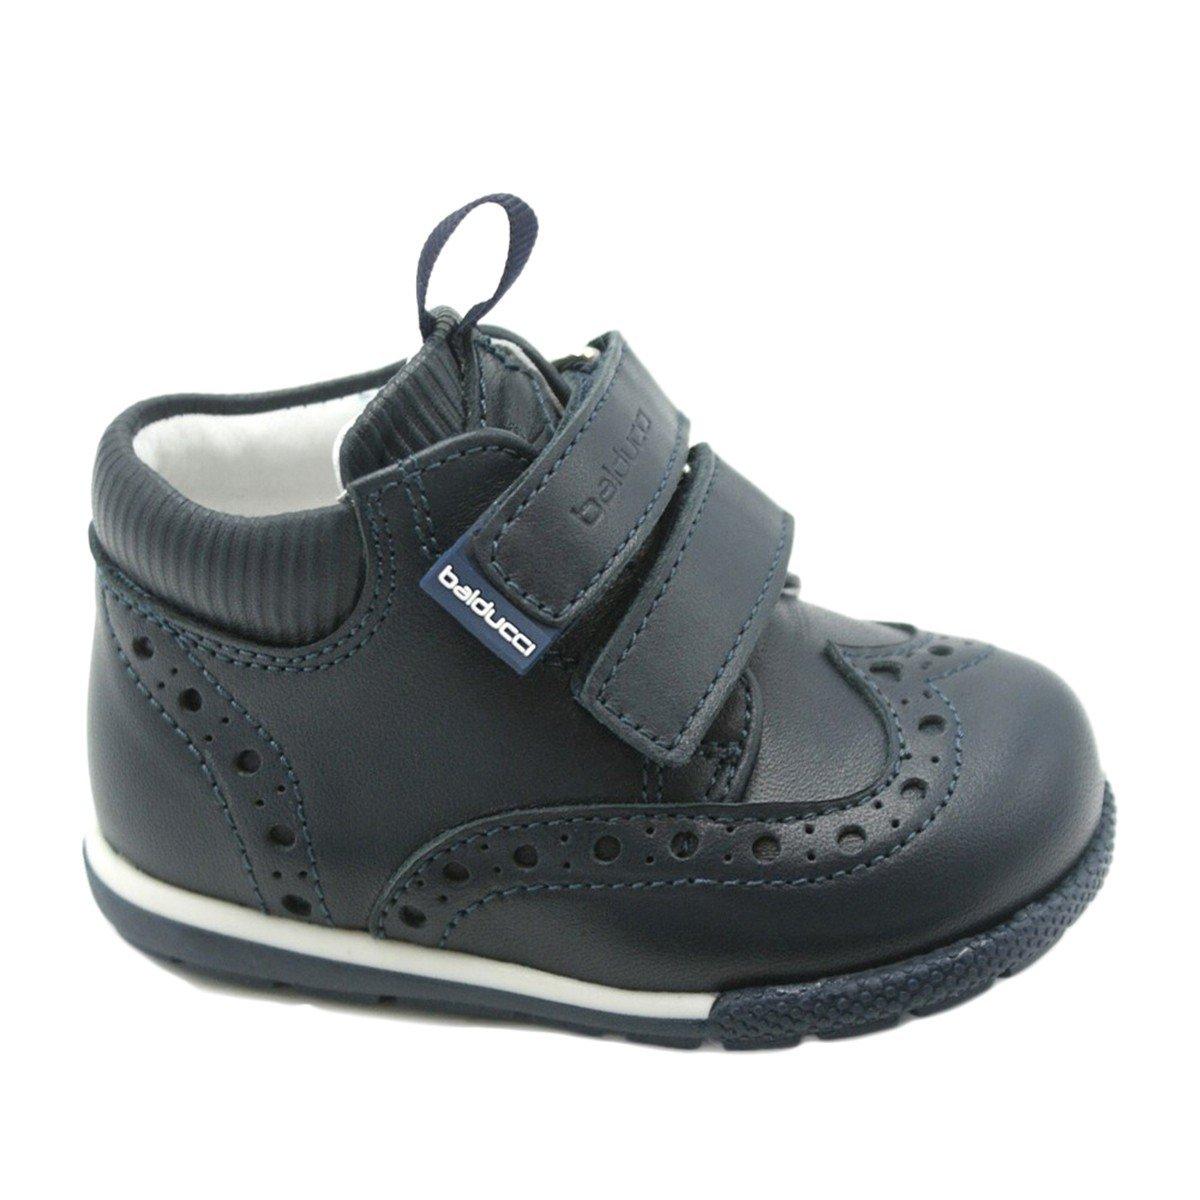 BALDUCCI Scarpe Baby Sneakers in Pelle blu CITA1001-BLEU  Amazon.co.uk   Shoes   Bags 56ec57a9ced